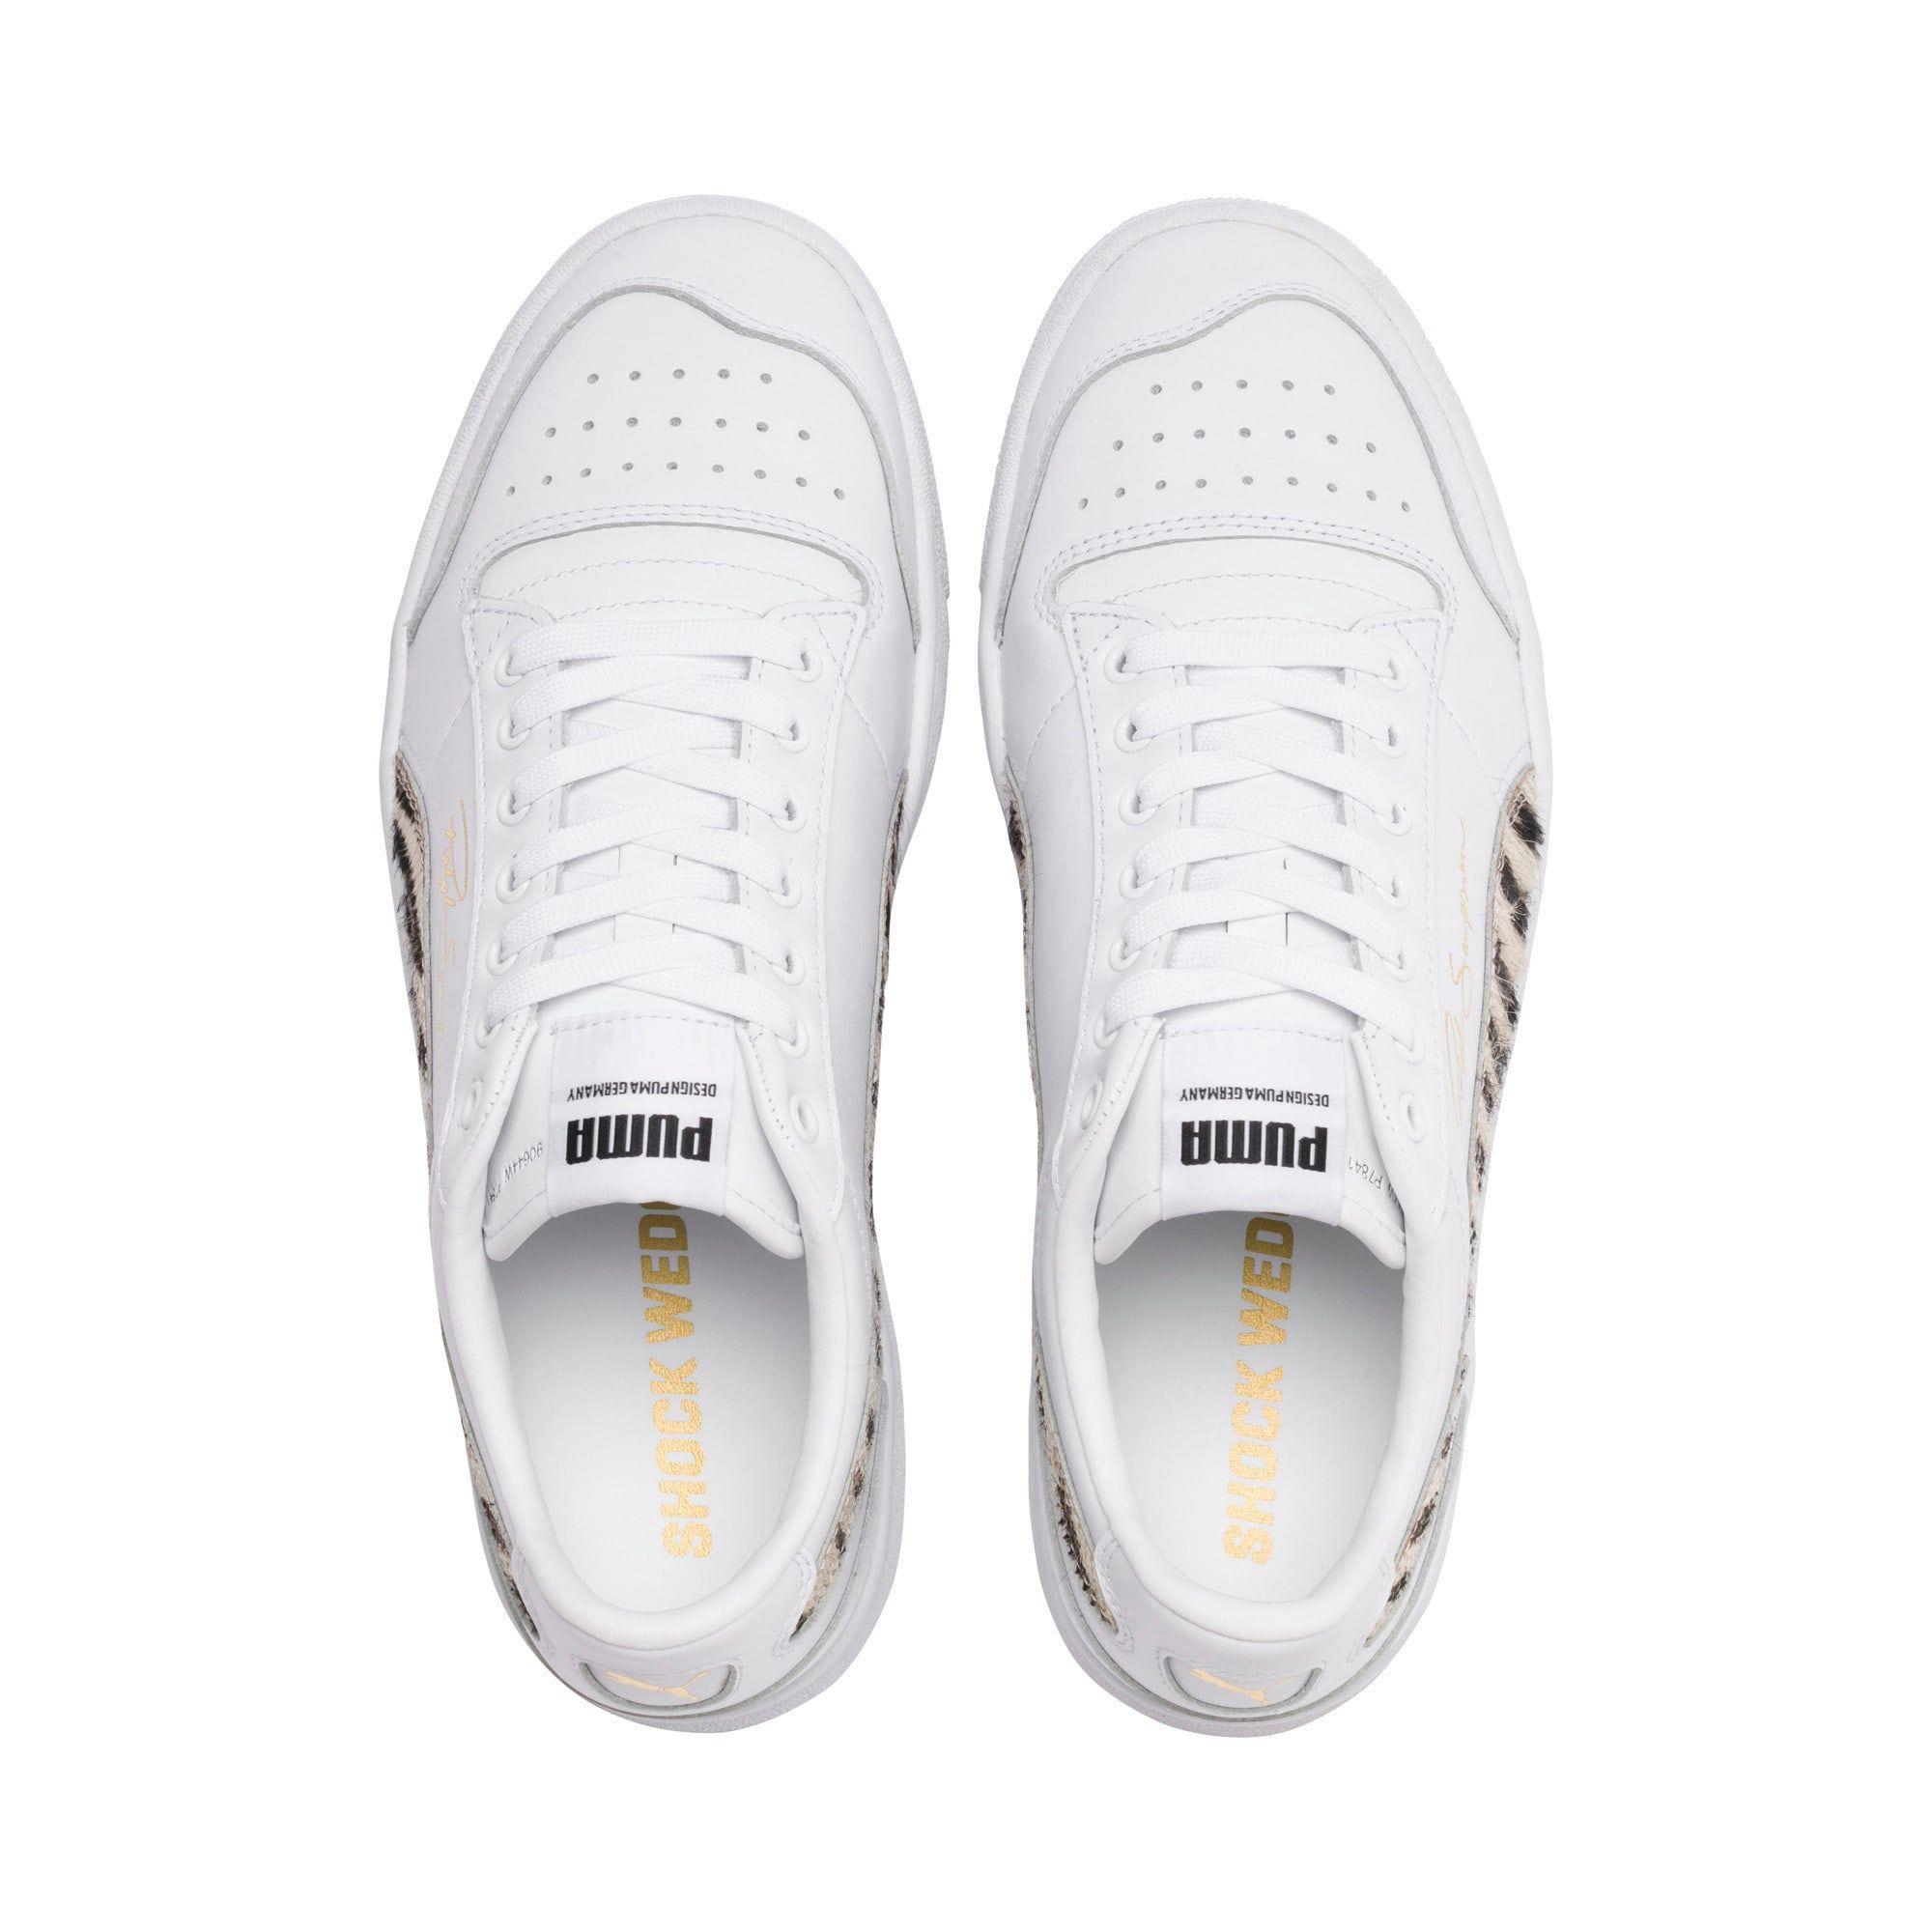 PUMA Ralph Sampson Lo Wild Trainers, White/Black/White, size 9, Shoes